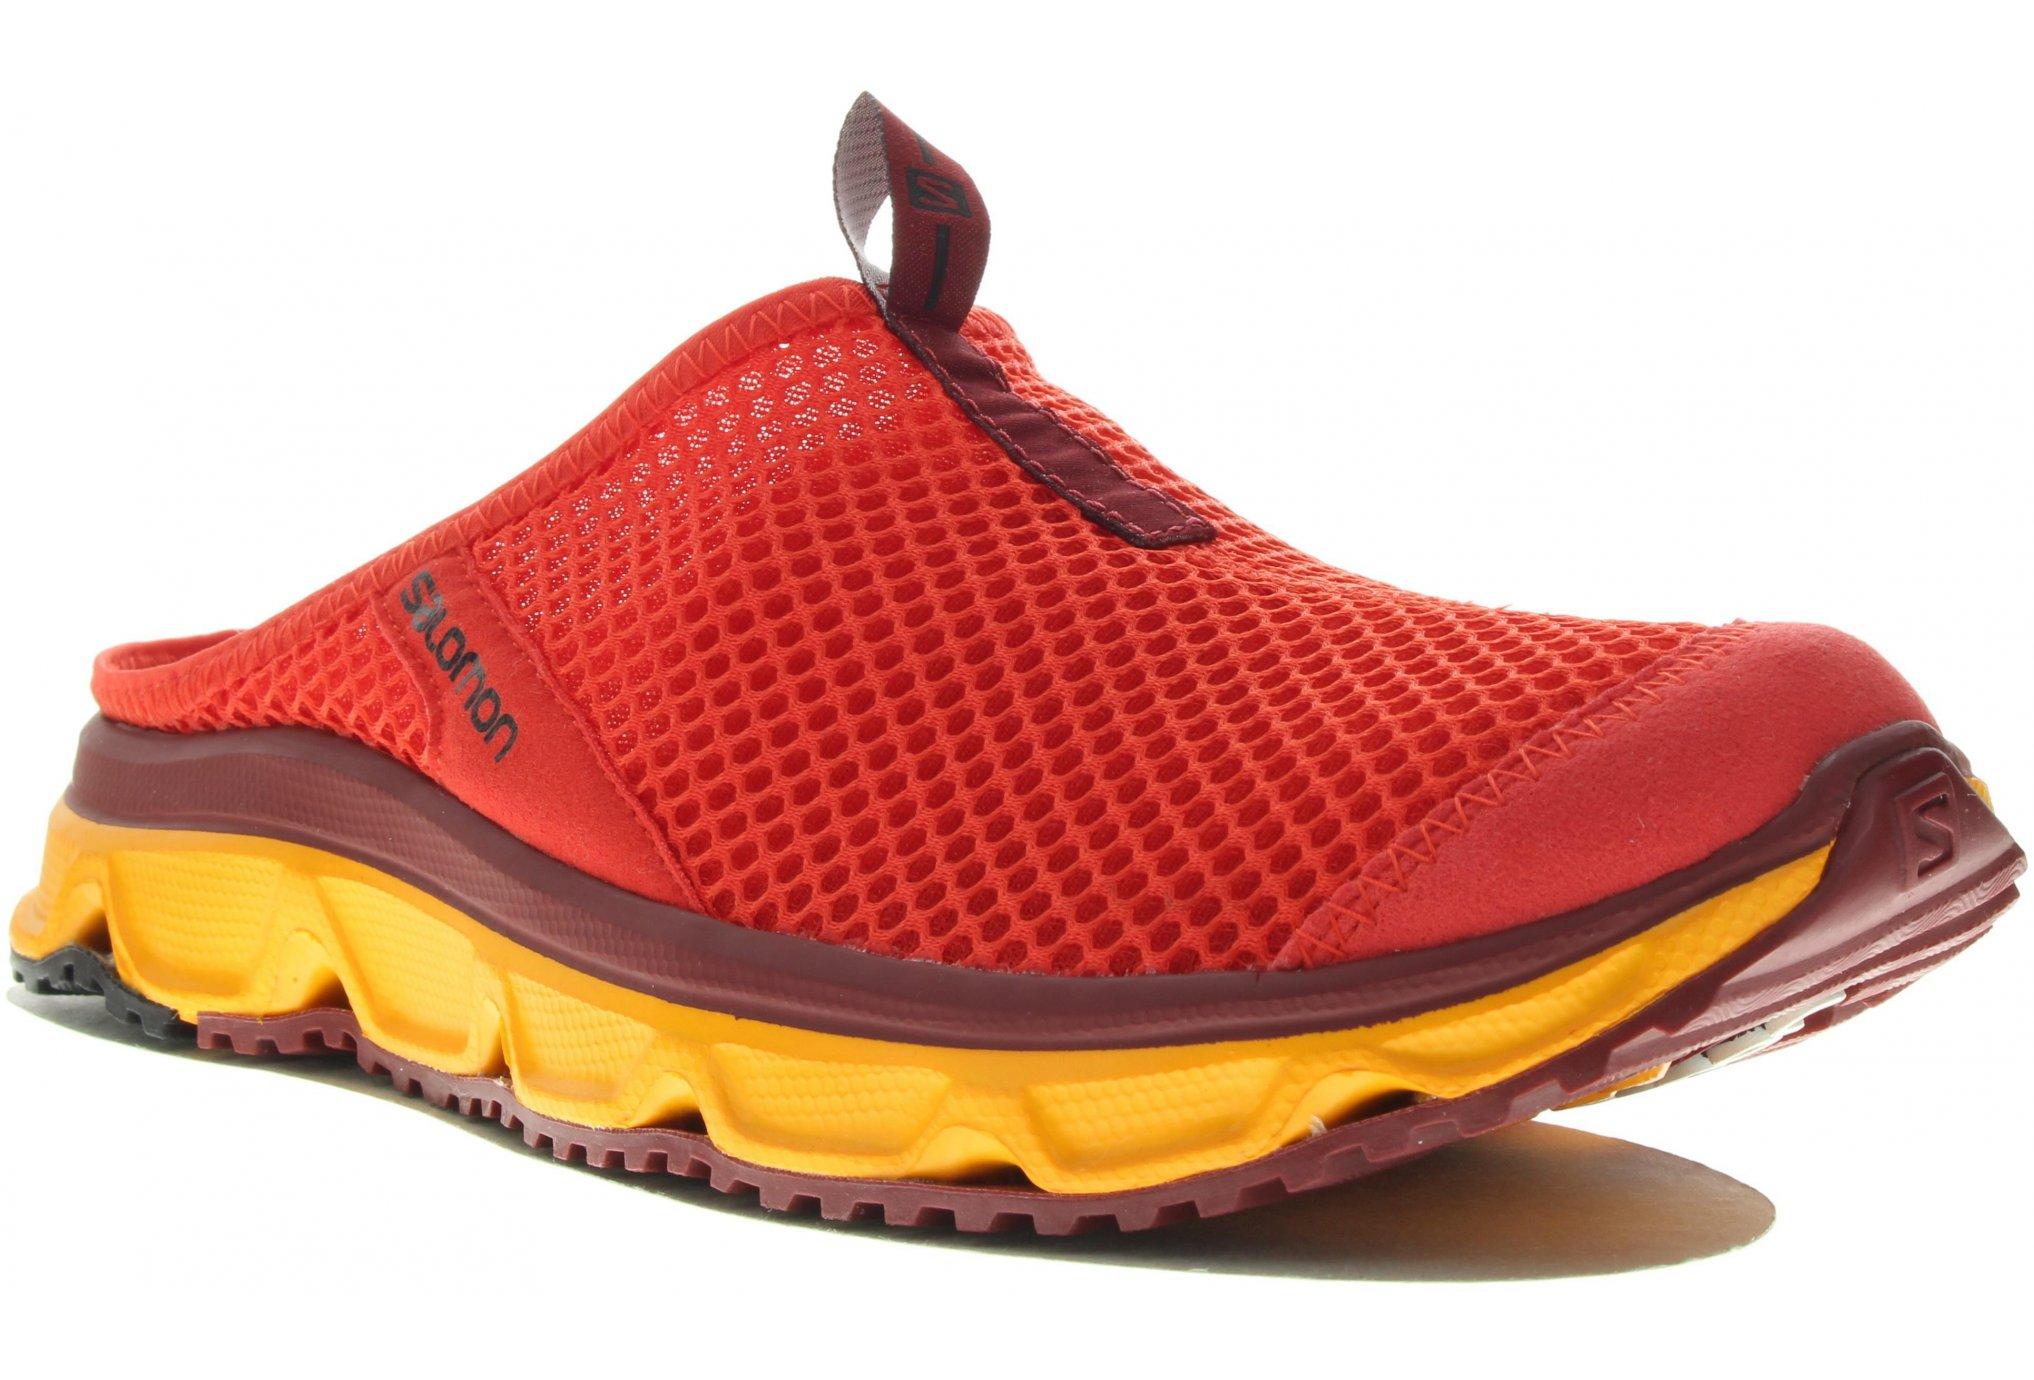 Session Homme Chaussures Salomon Slide M 3 Trail 0 Rx CxoBQdWre